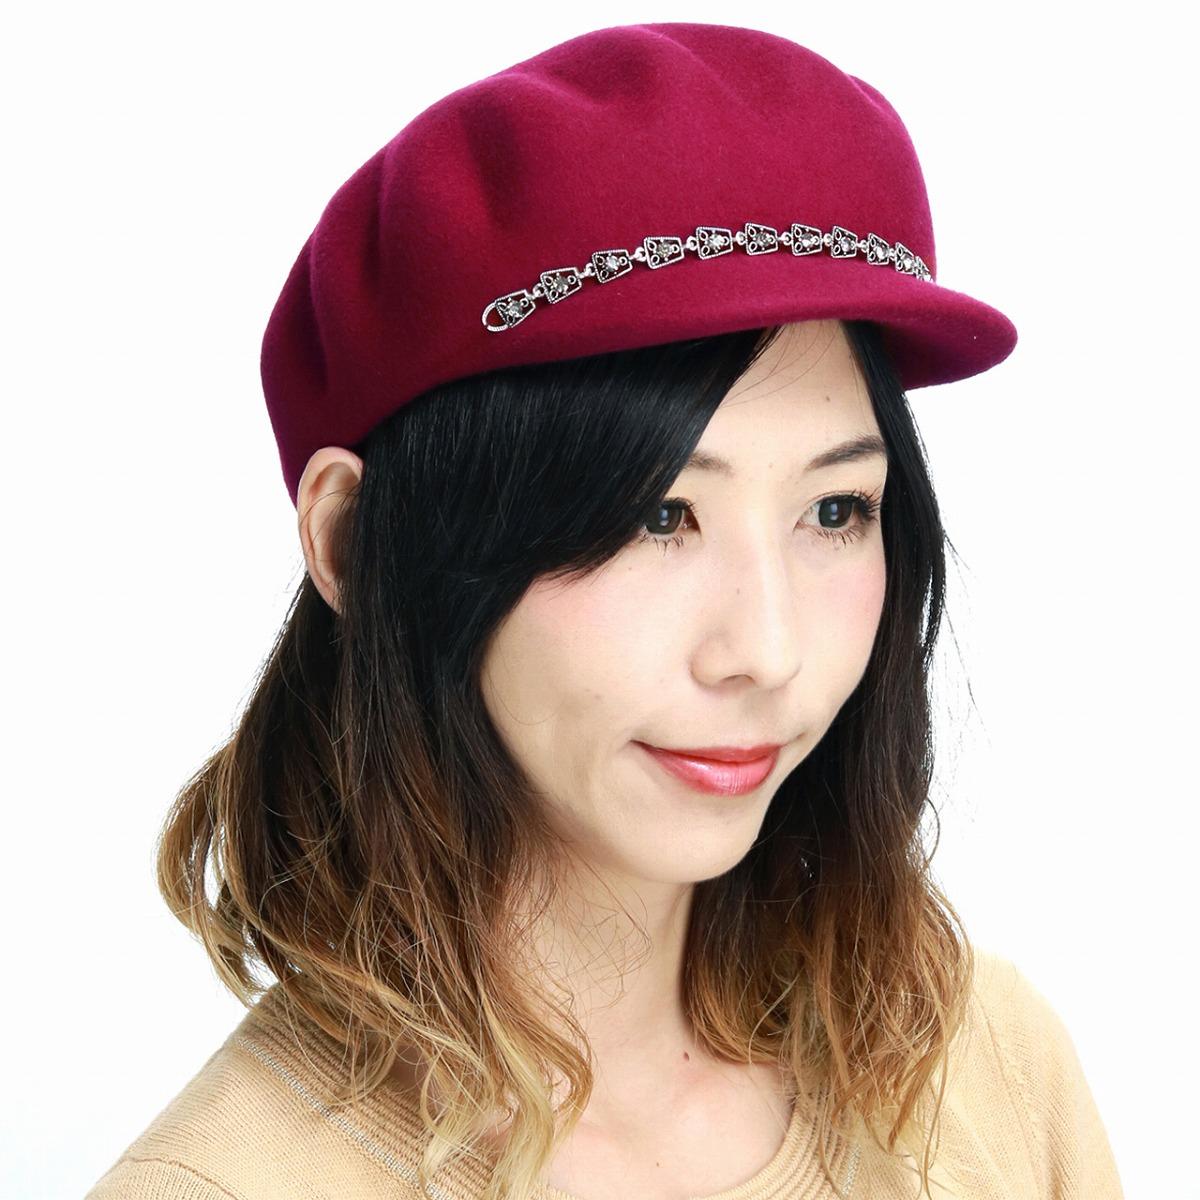 Casquette hat hat GALLIANO SORBATTI cap Mrs. hat refined woman hat   wine   newsboy ... 2d6f2d538990